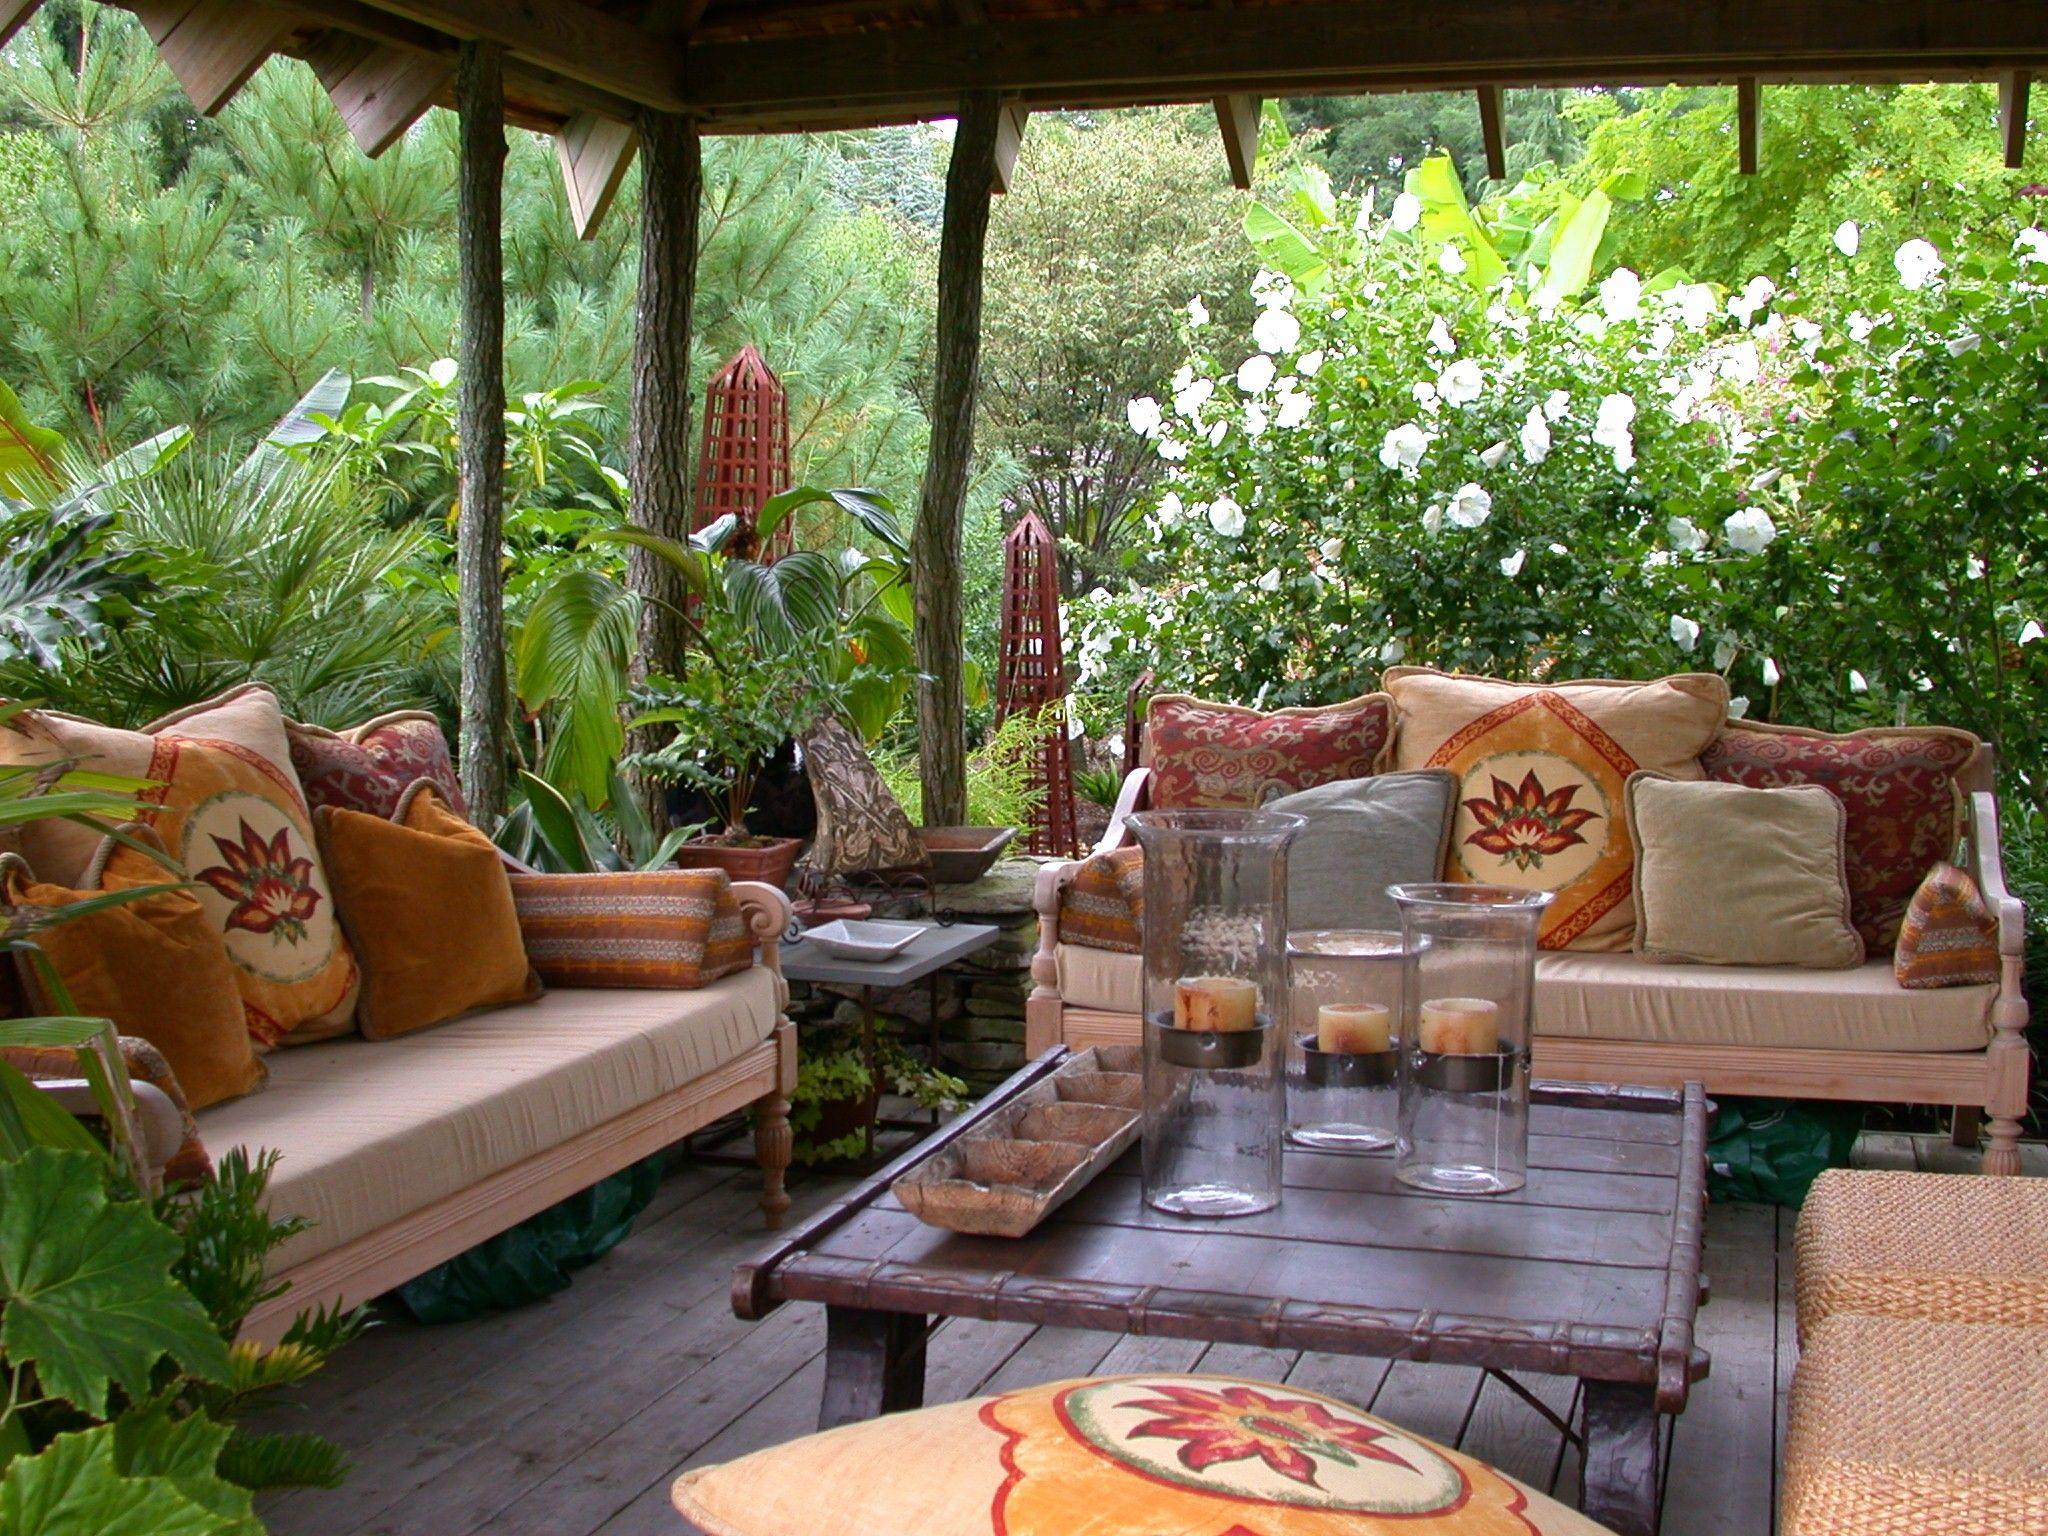 Meuble De Jardin Inspirant Dream Dream Dream Terrasses Of 38 Charmant Meuble De Jardin